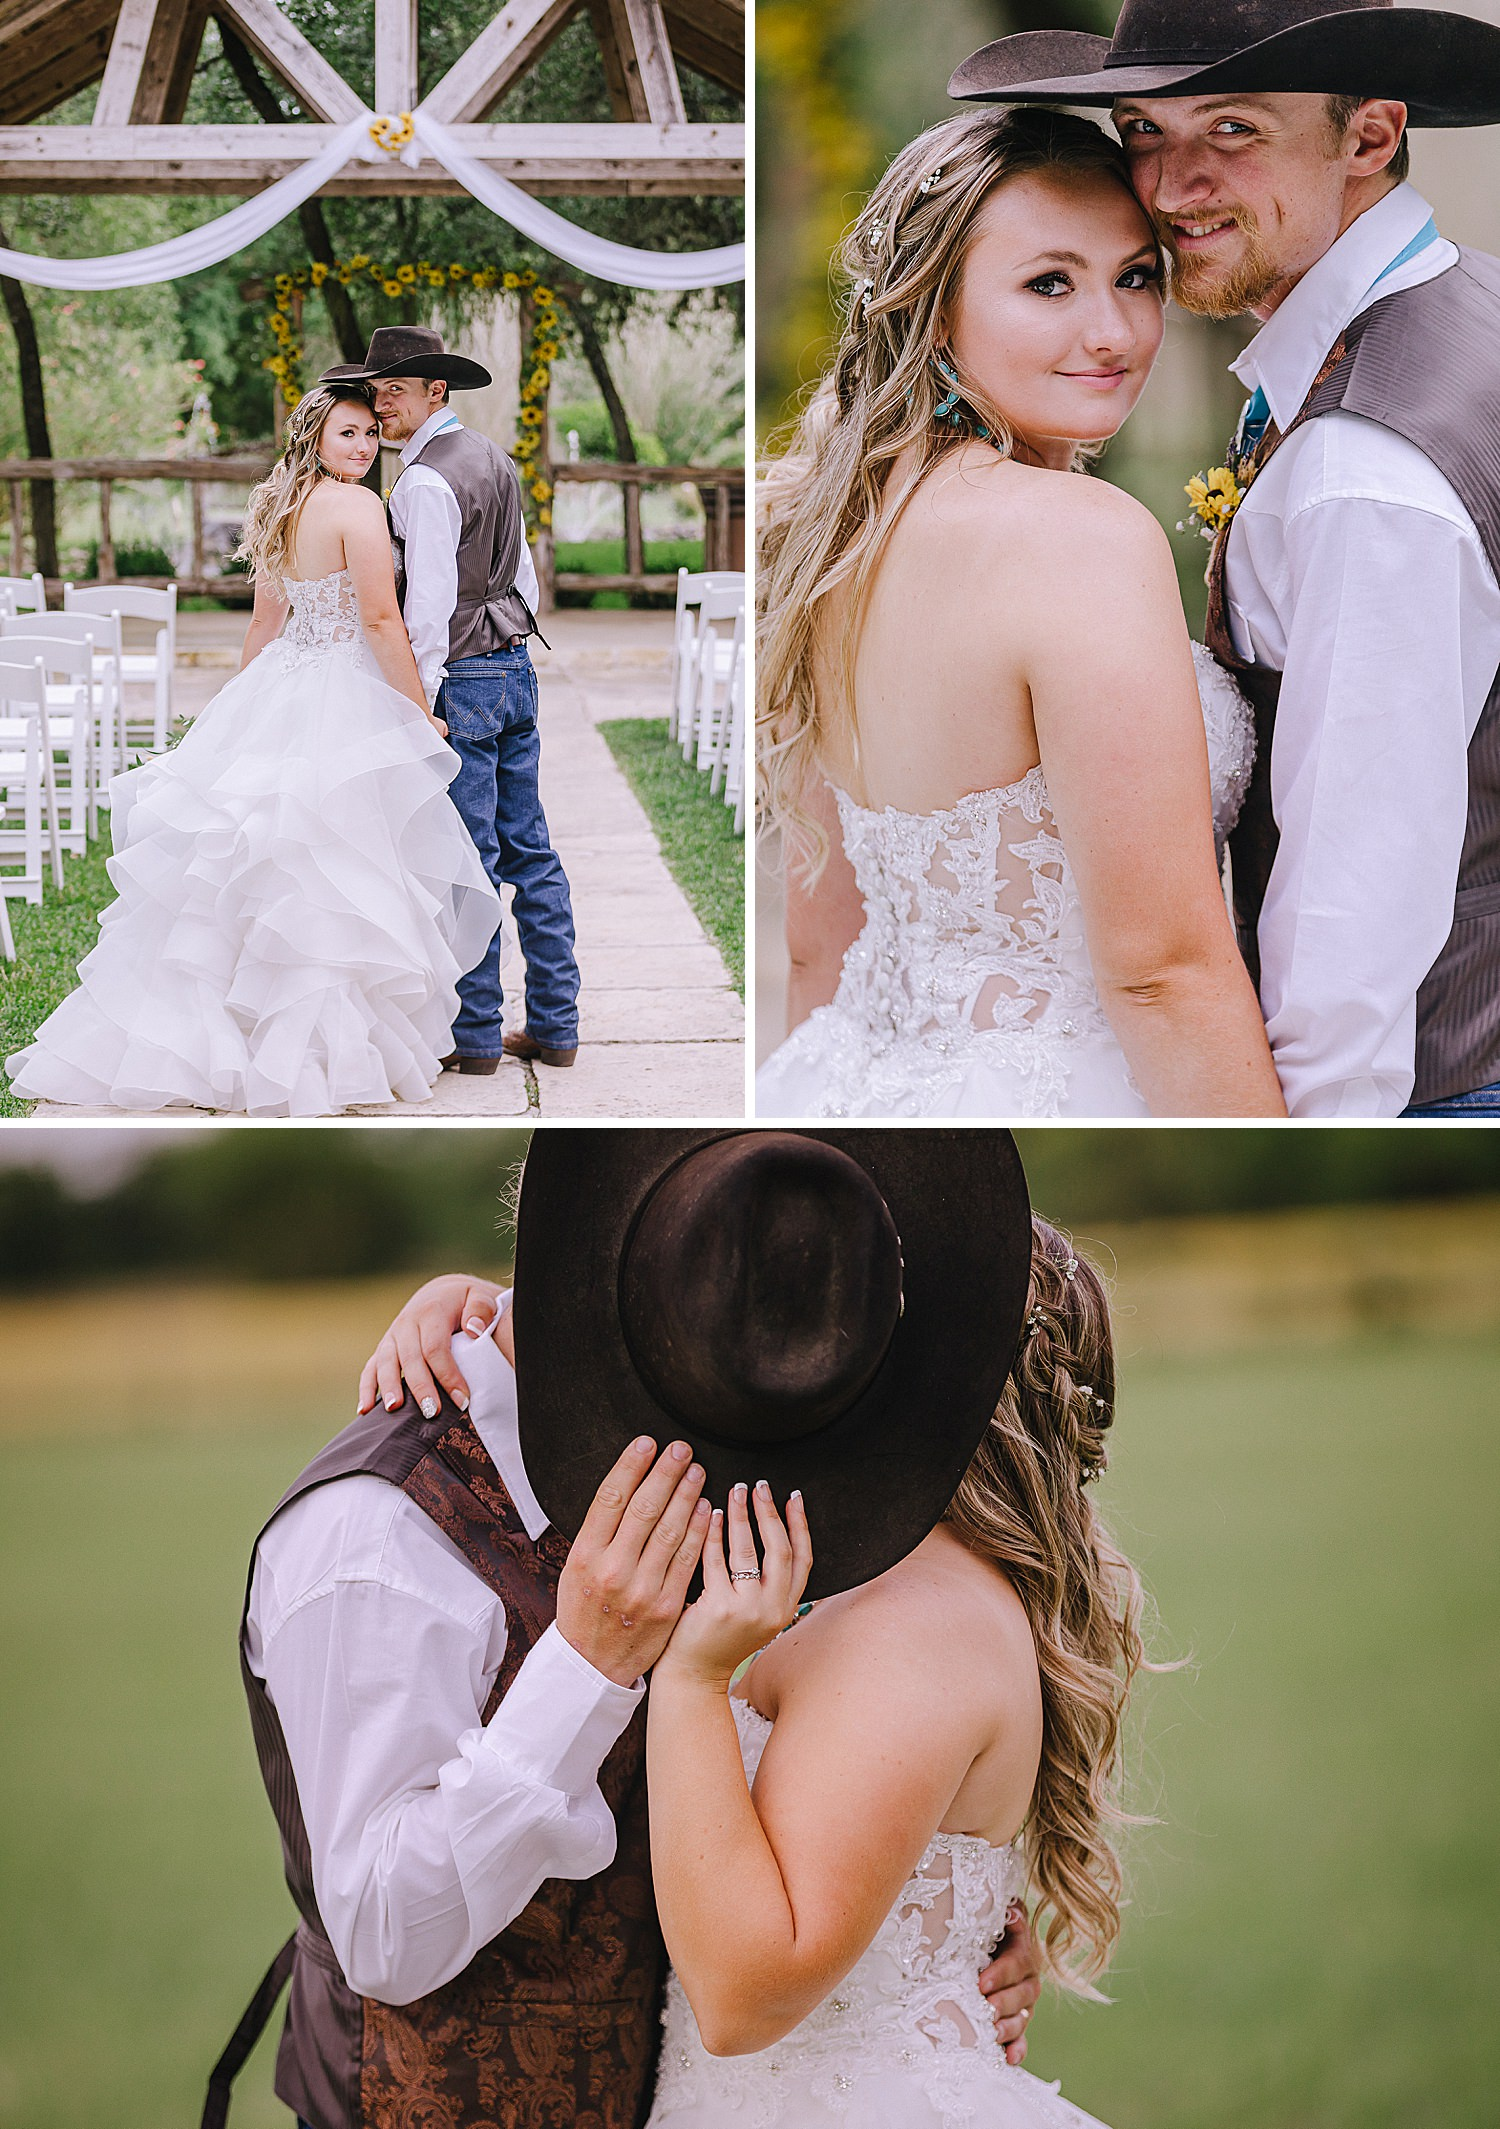 Carly-Barton-Photography-Old-Town-Texas-Rustic-Wedding-Photos-Sunflowers-Boots-Kyle-Texas_0066.jpg